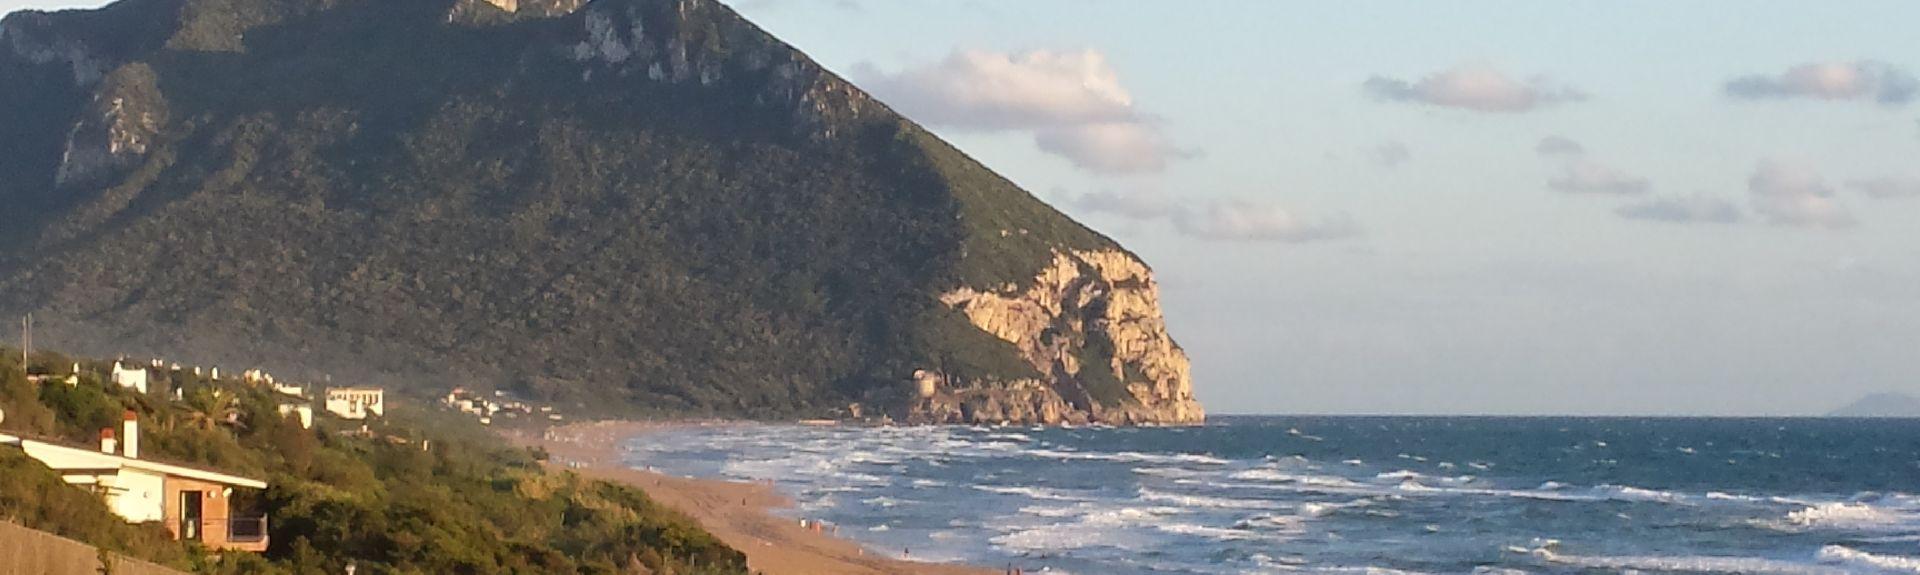 Sabaudia, Lácio, Itália